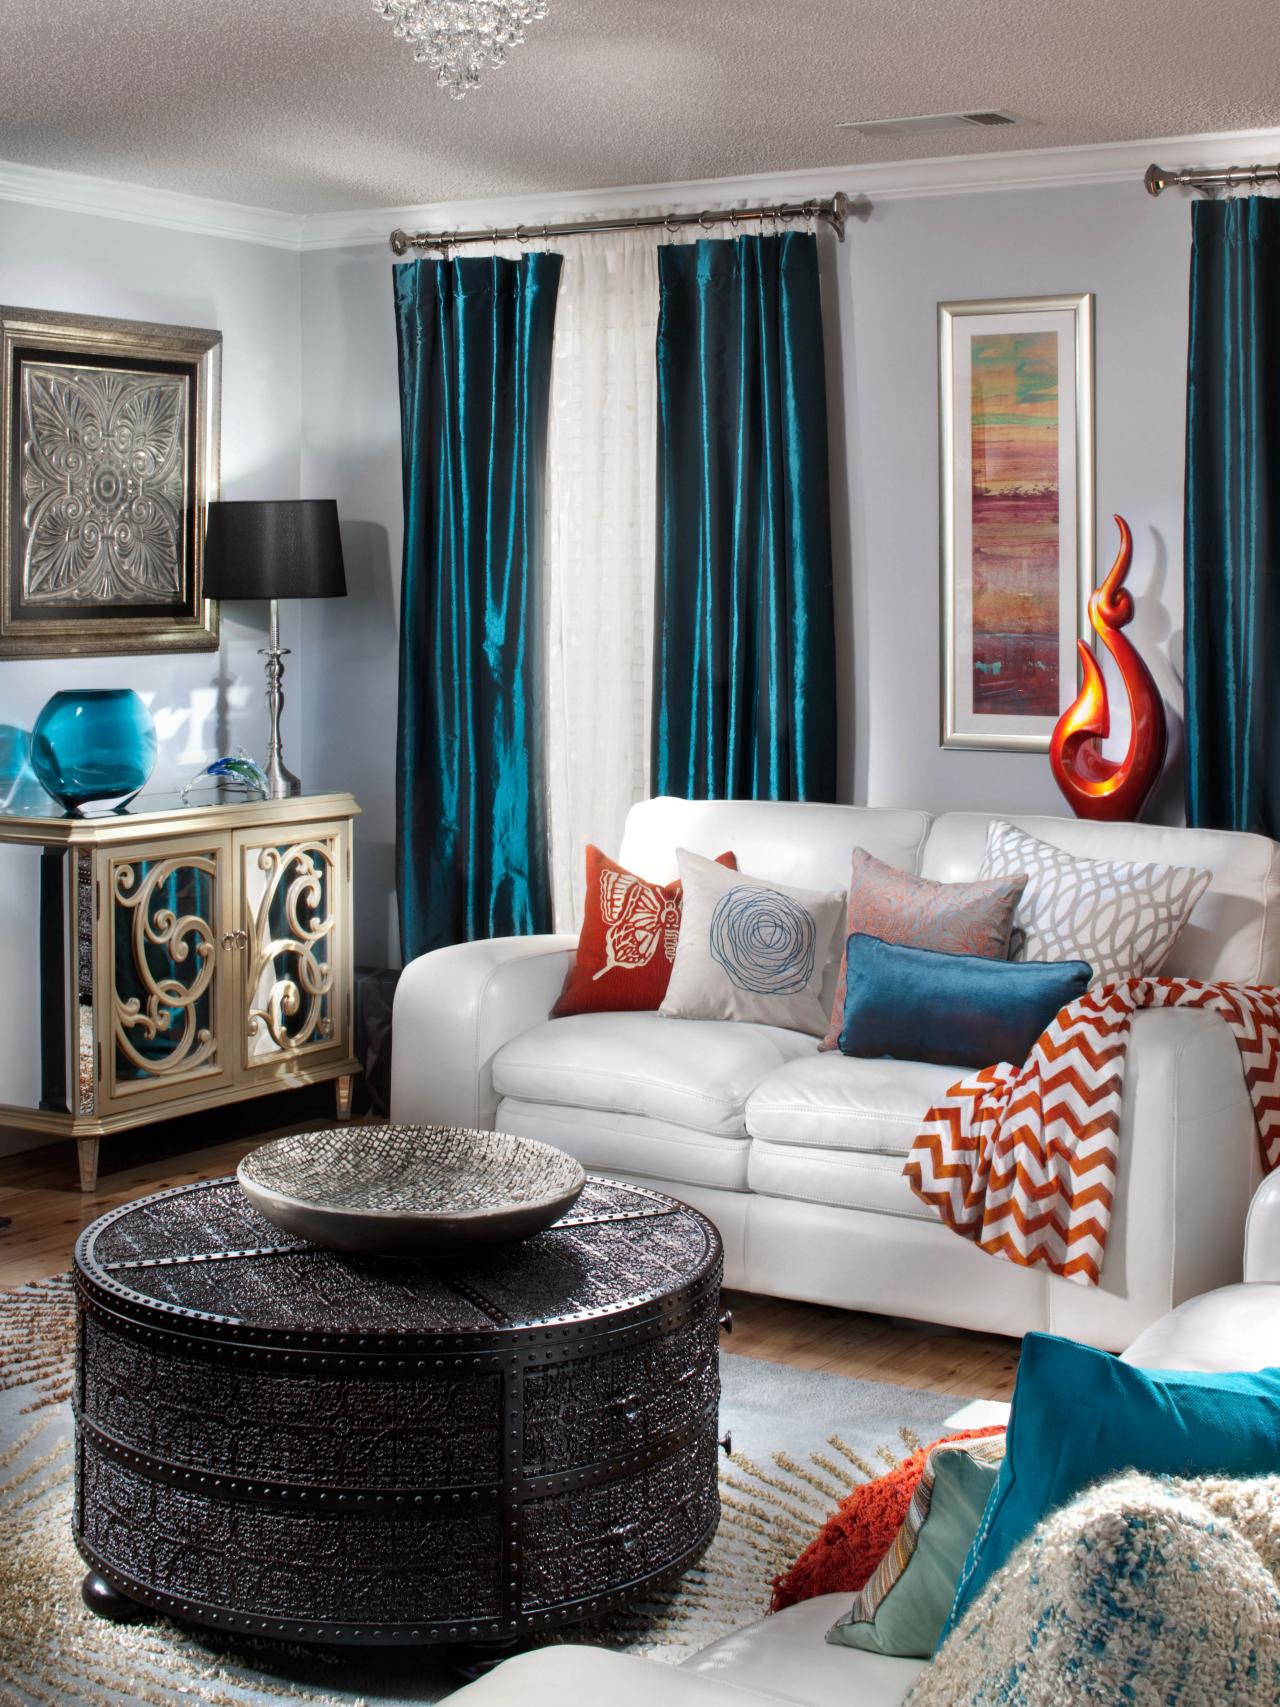 25 Transitional Living Room Design Ideas - Decoration Love